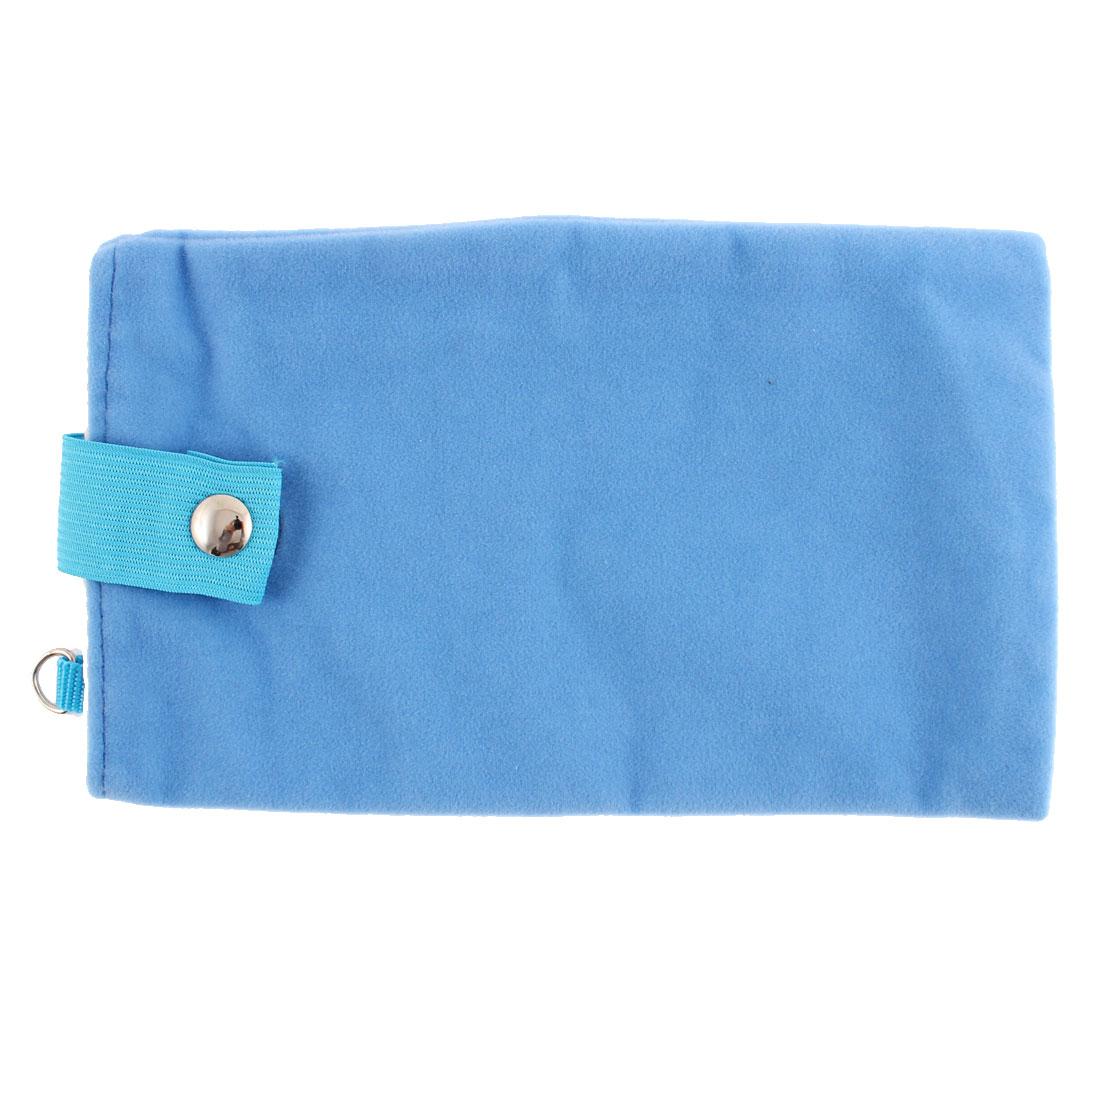 Unique Bargains Dual Layer Magnetic Clasp Button Cell Phone Pouch Sleeve Bag Light Blue 18x11cm